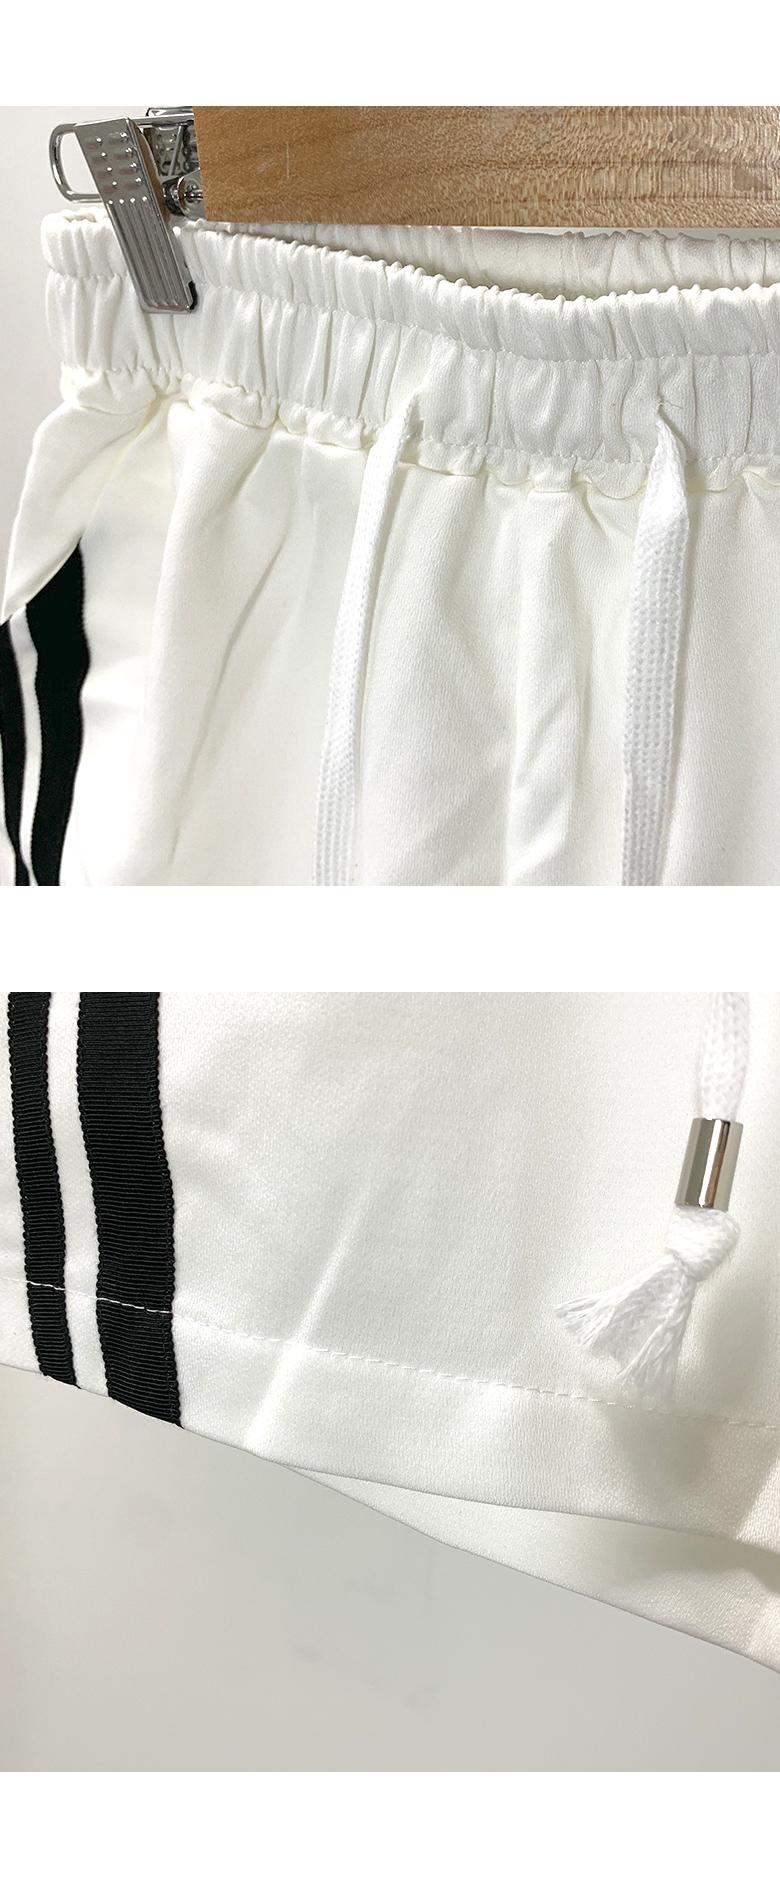 Color line training shorts